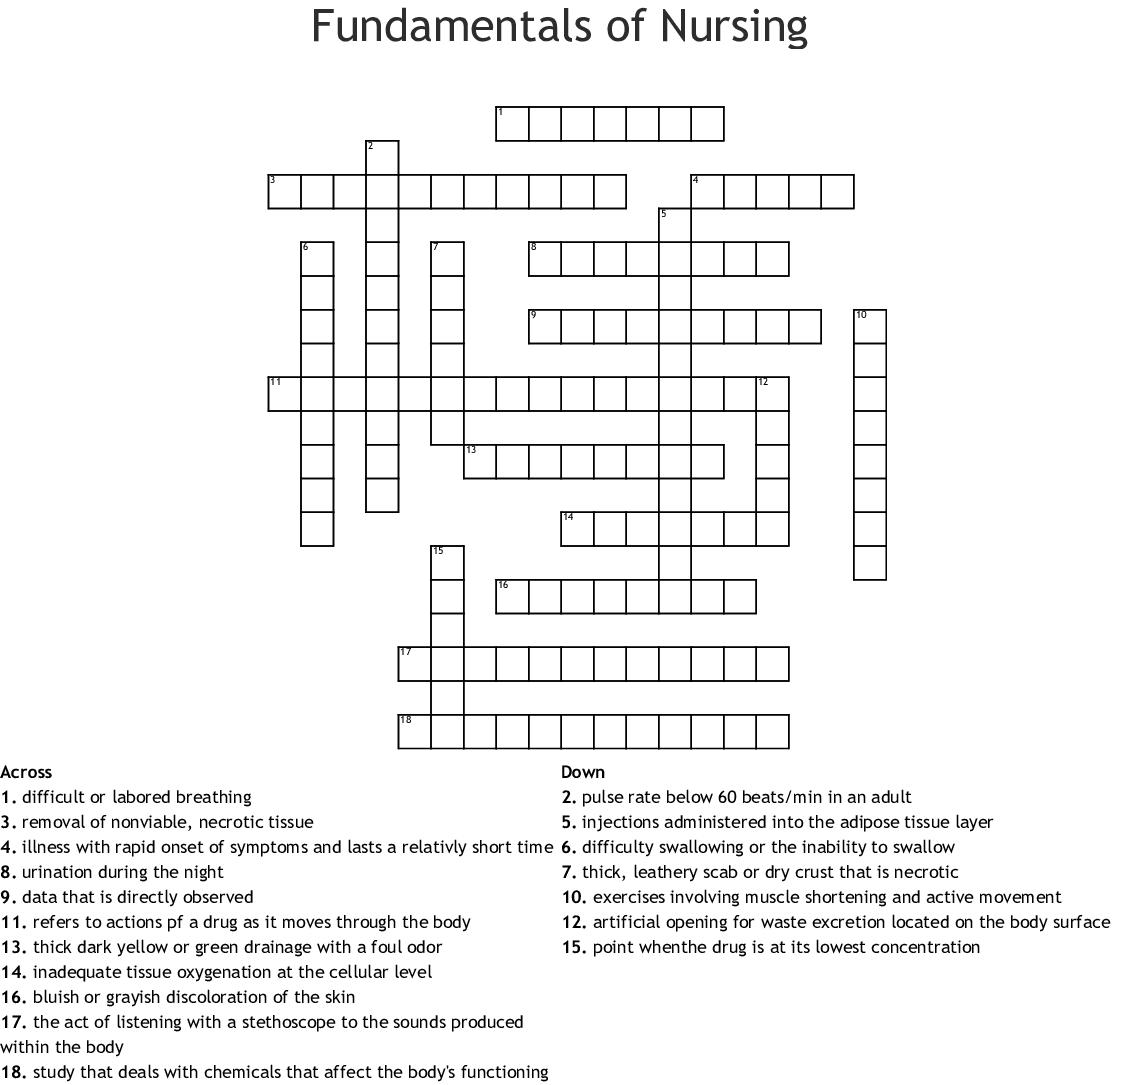 Fundamentals Of Nursing Crossword Wordmint